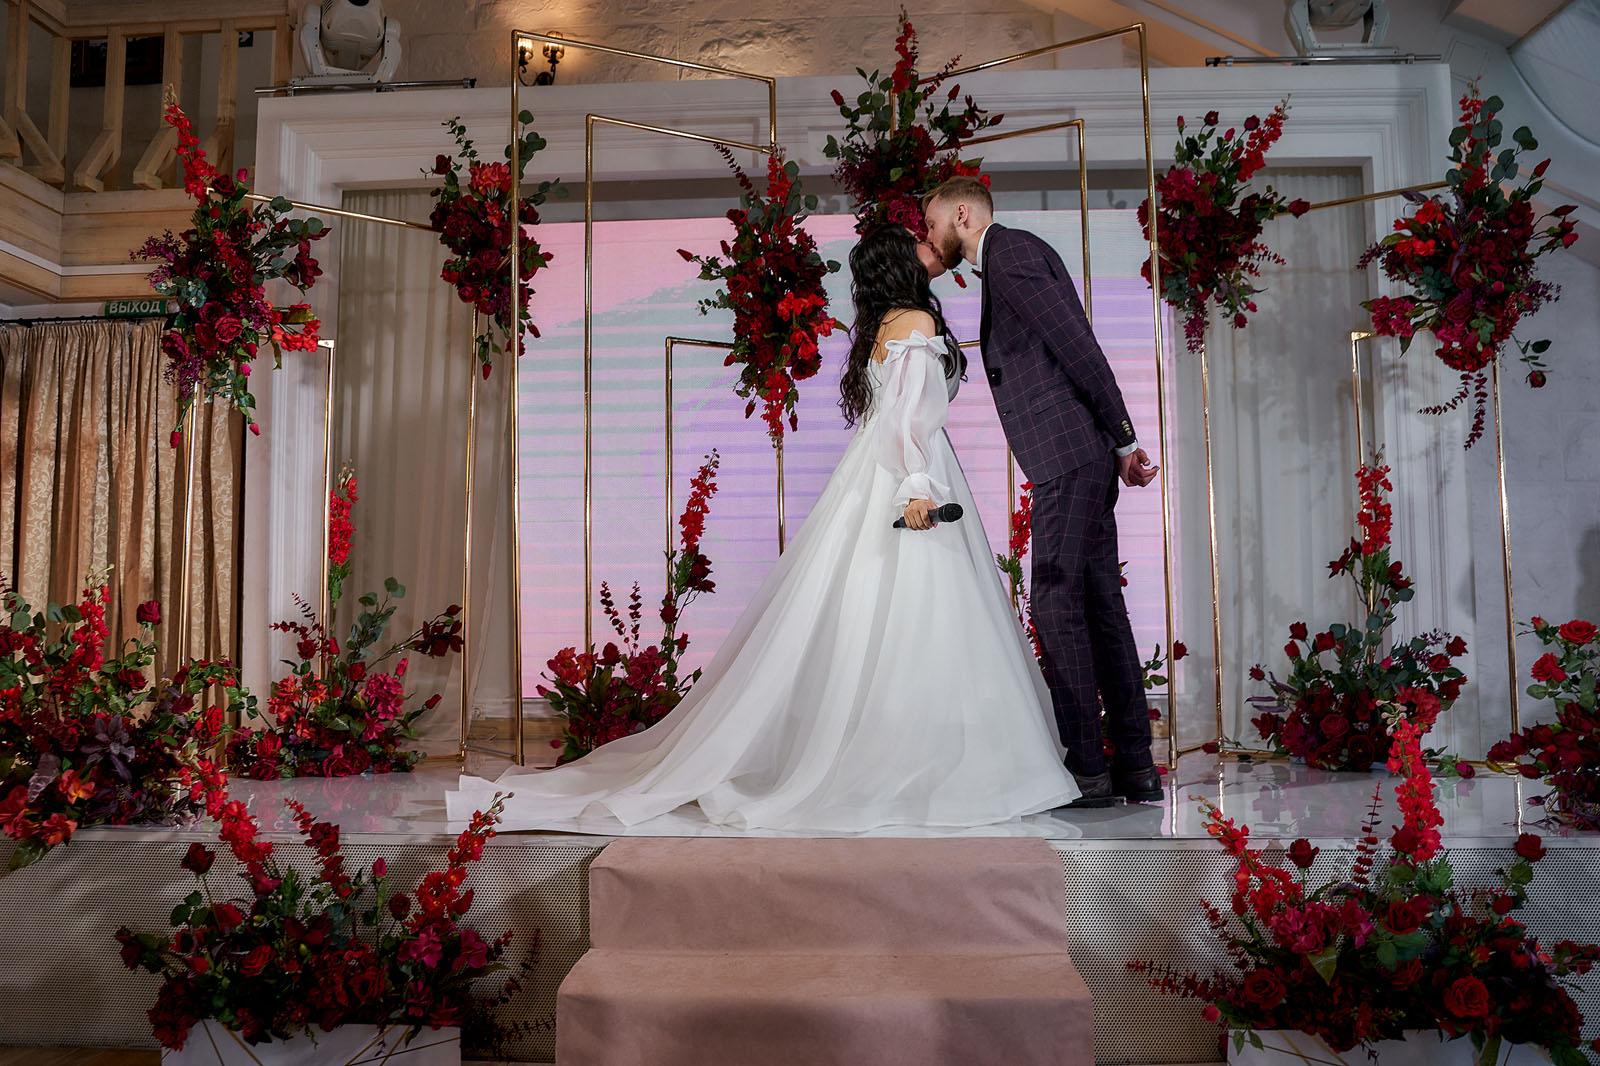 wedding@bekarev2021-04-10-16-38-33.jpg